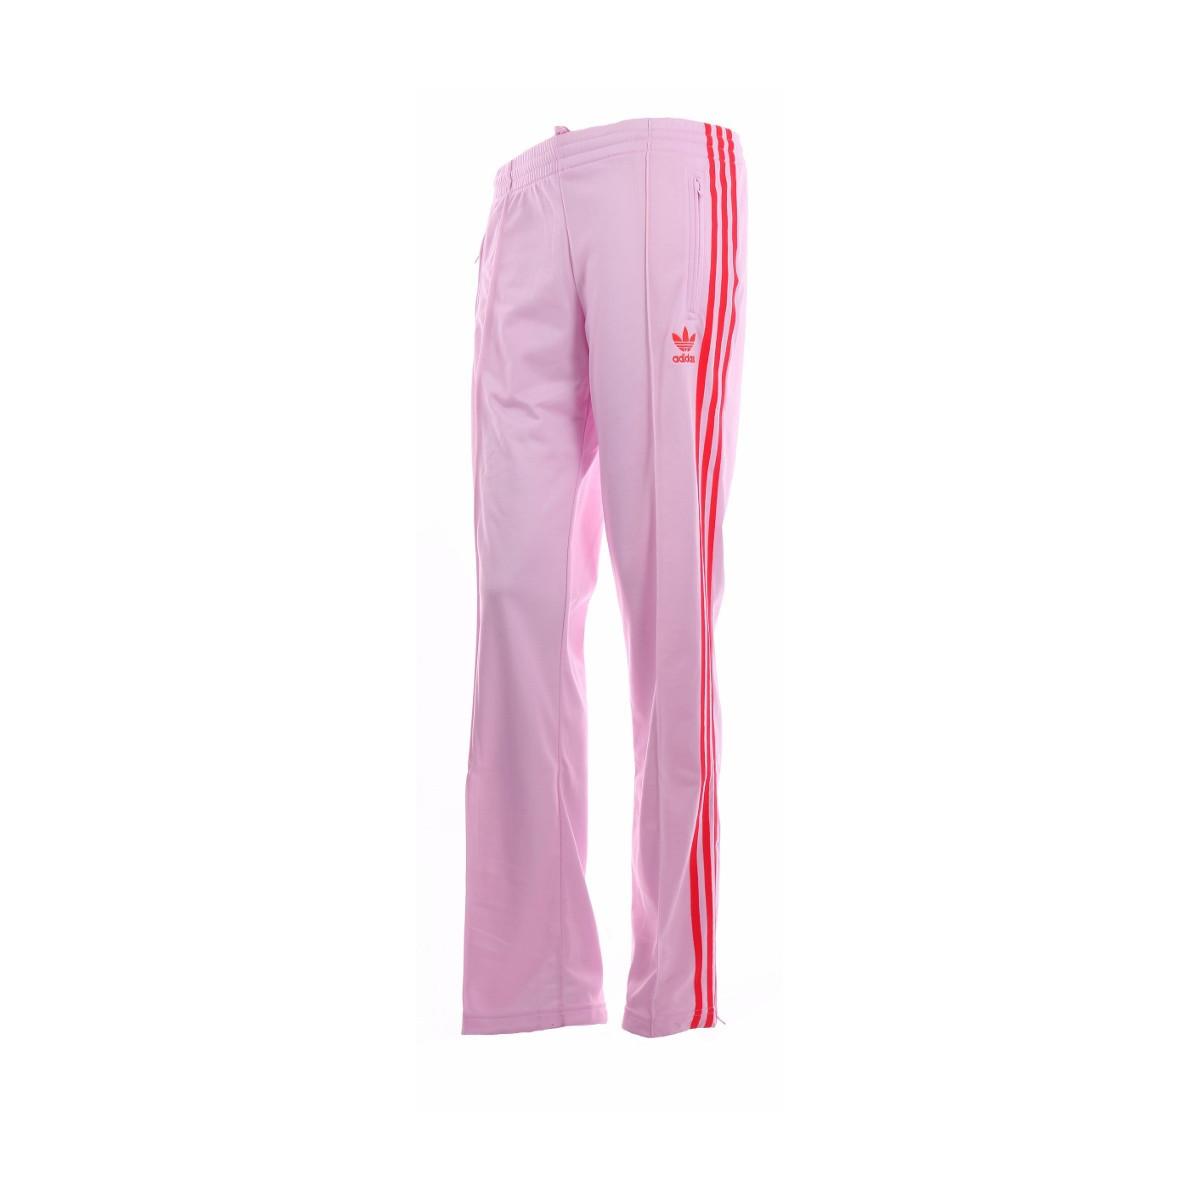 De Originals Pantalon Survêtement Adidas Downtownstock Firebird com Ybgyf67